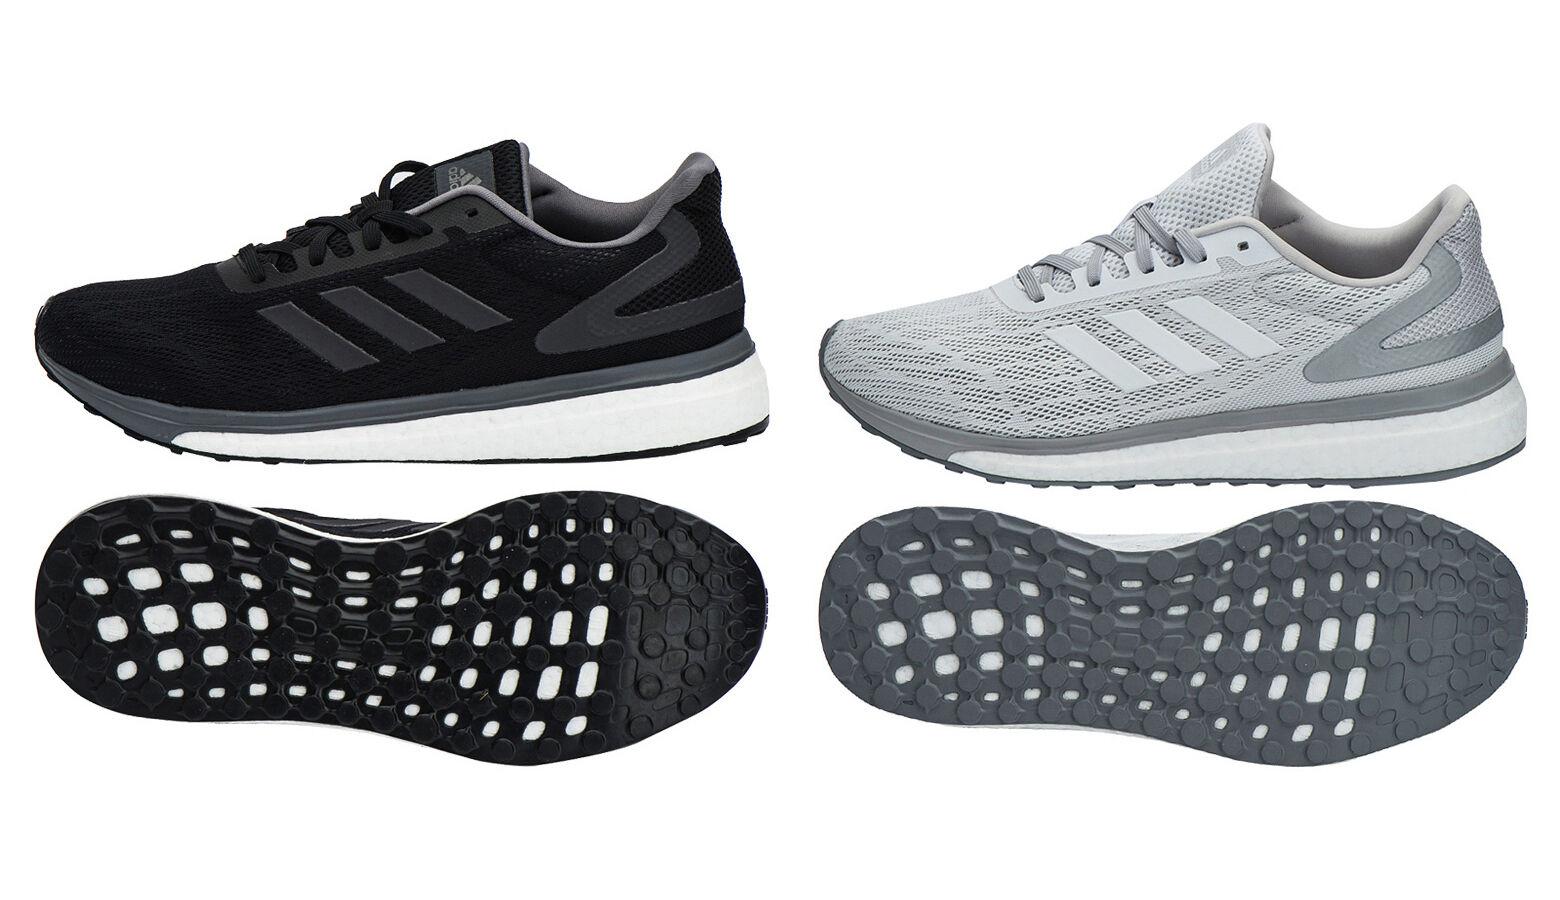 Adidas Response Boost Running Running Running schuhe BB3618 BB3617 Athletic Turnschuhe Trainers 82b862